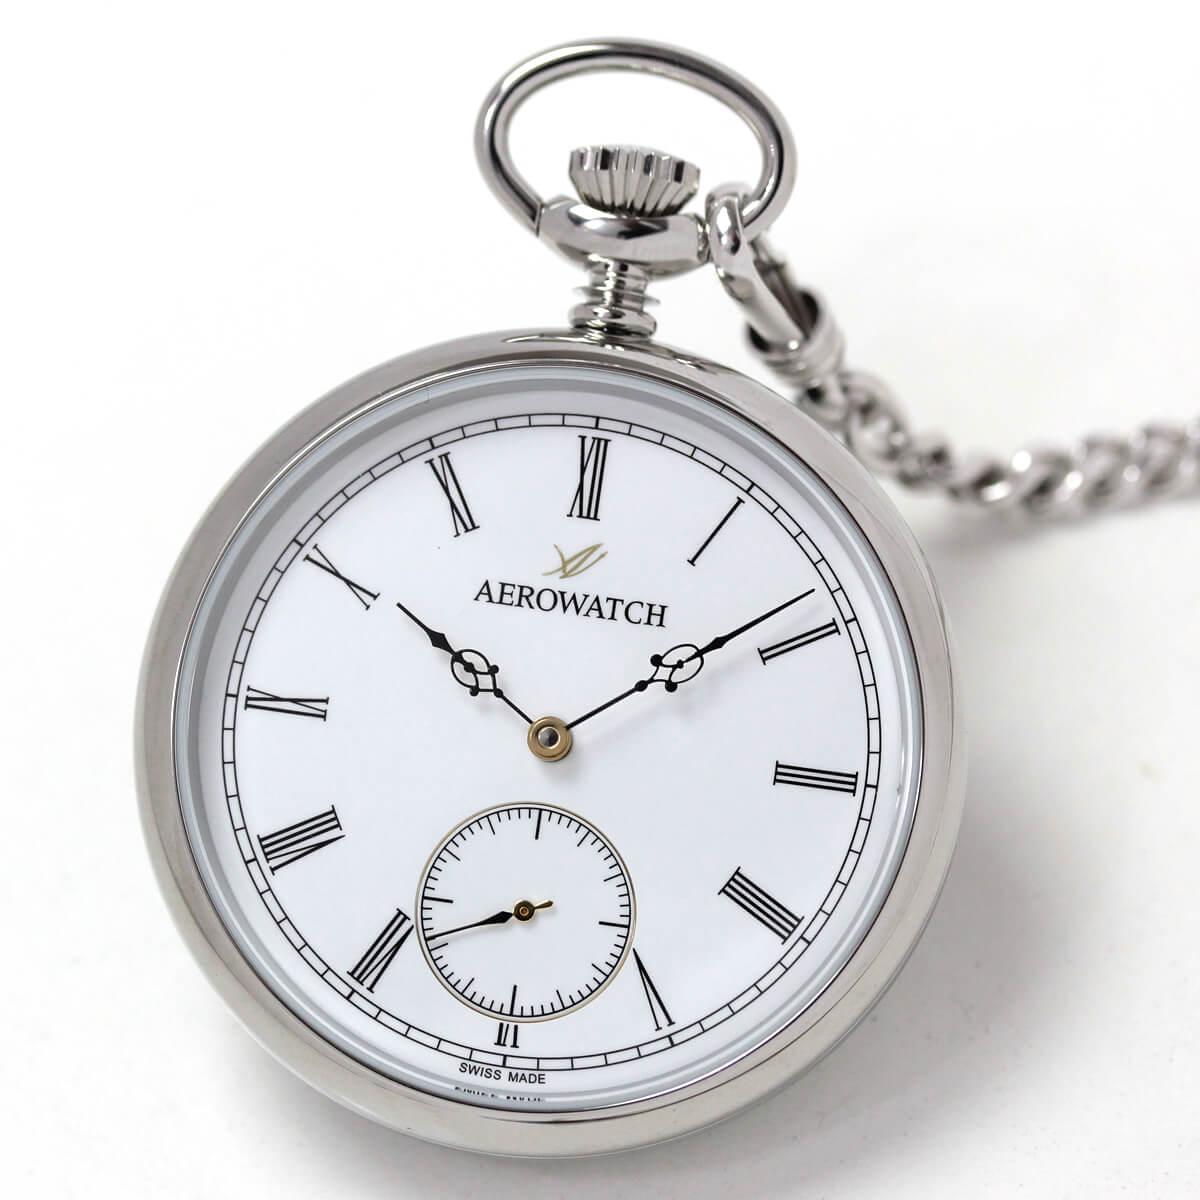 AERO(アエロ) 手巻き式懐中時計 50616aa03